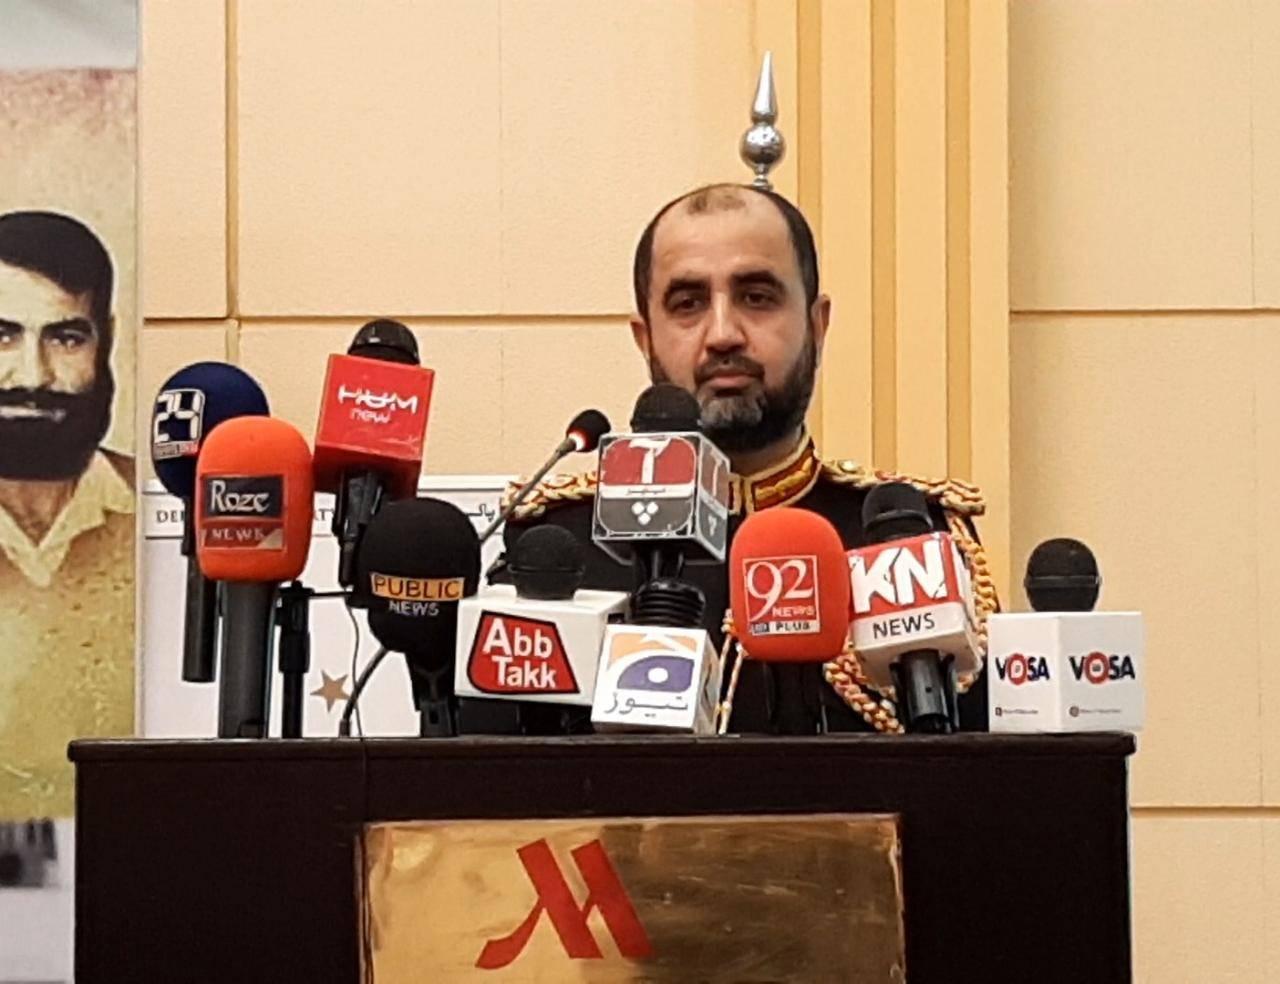 Pakistani Defense Attaché Brig. Haroon Ishaq Raja at the mike.